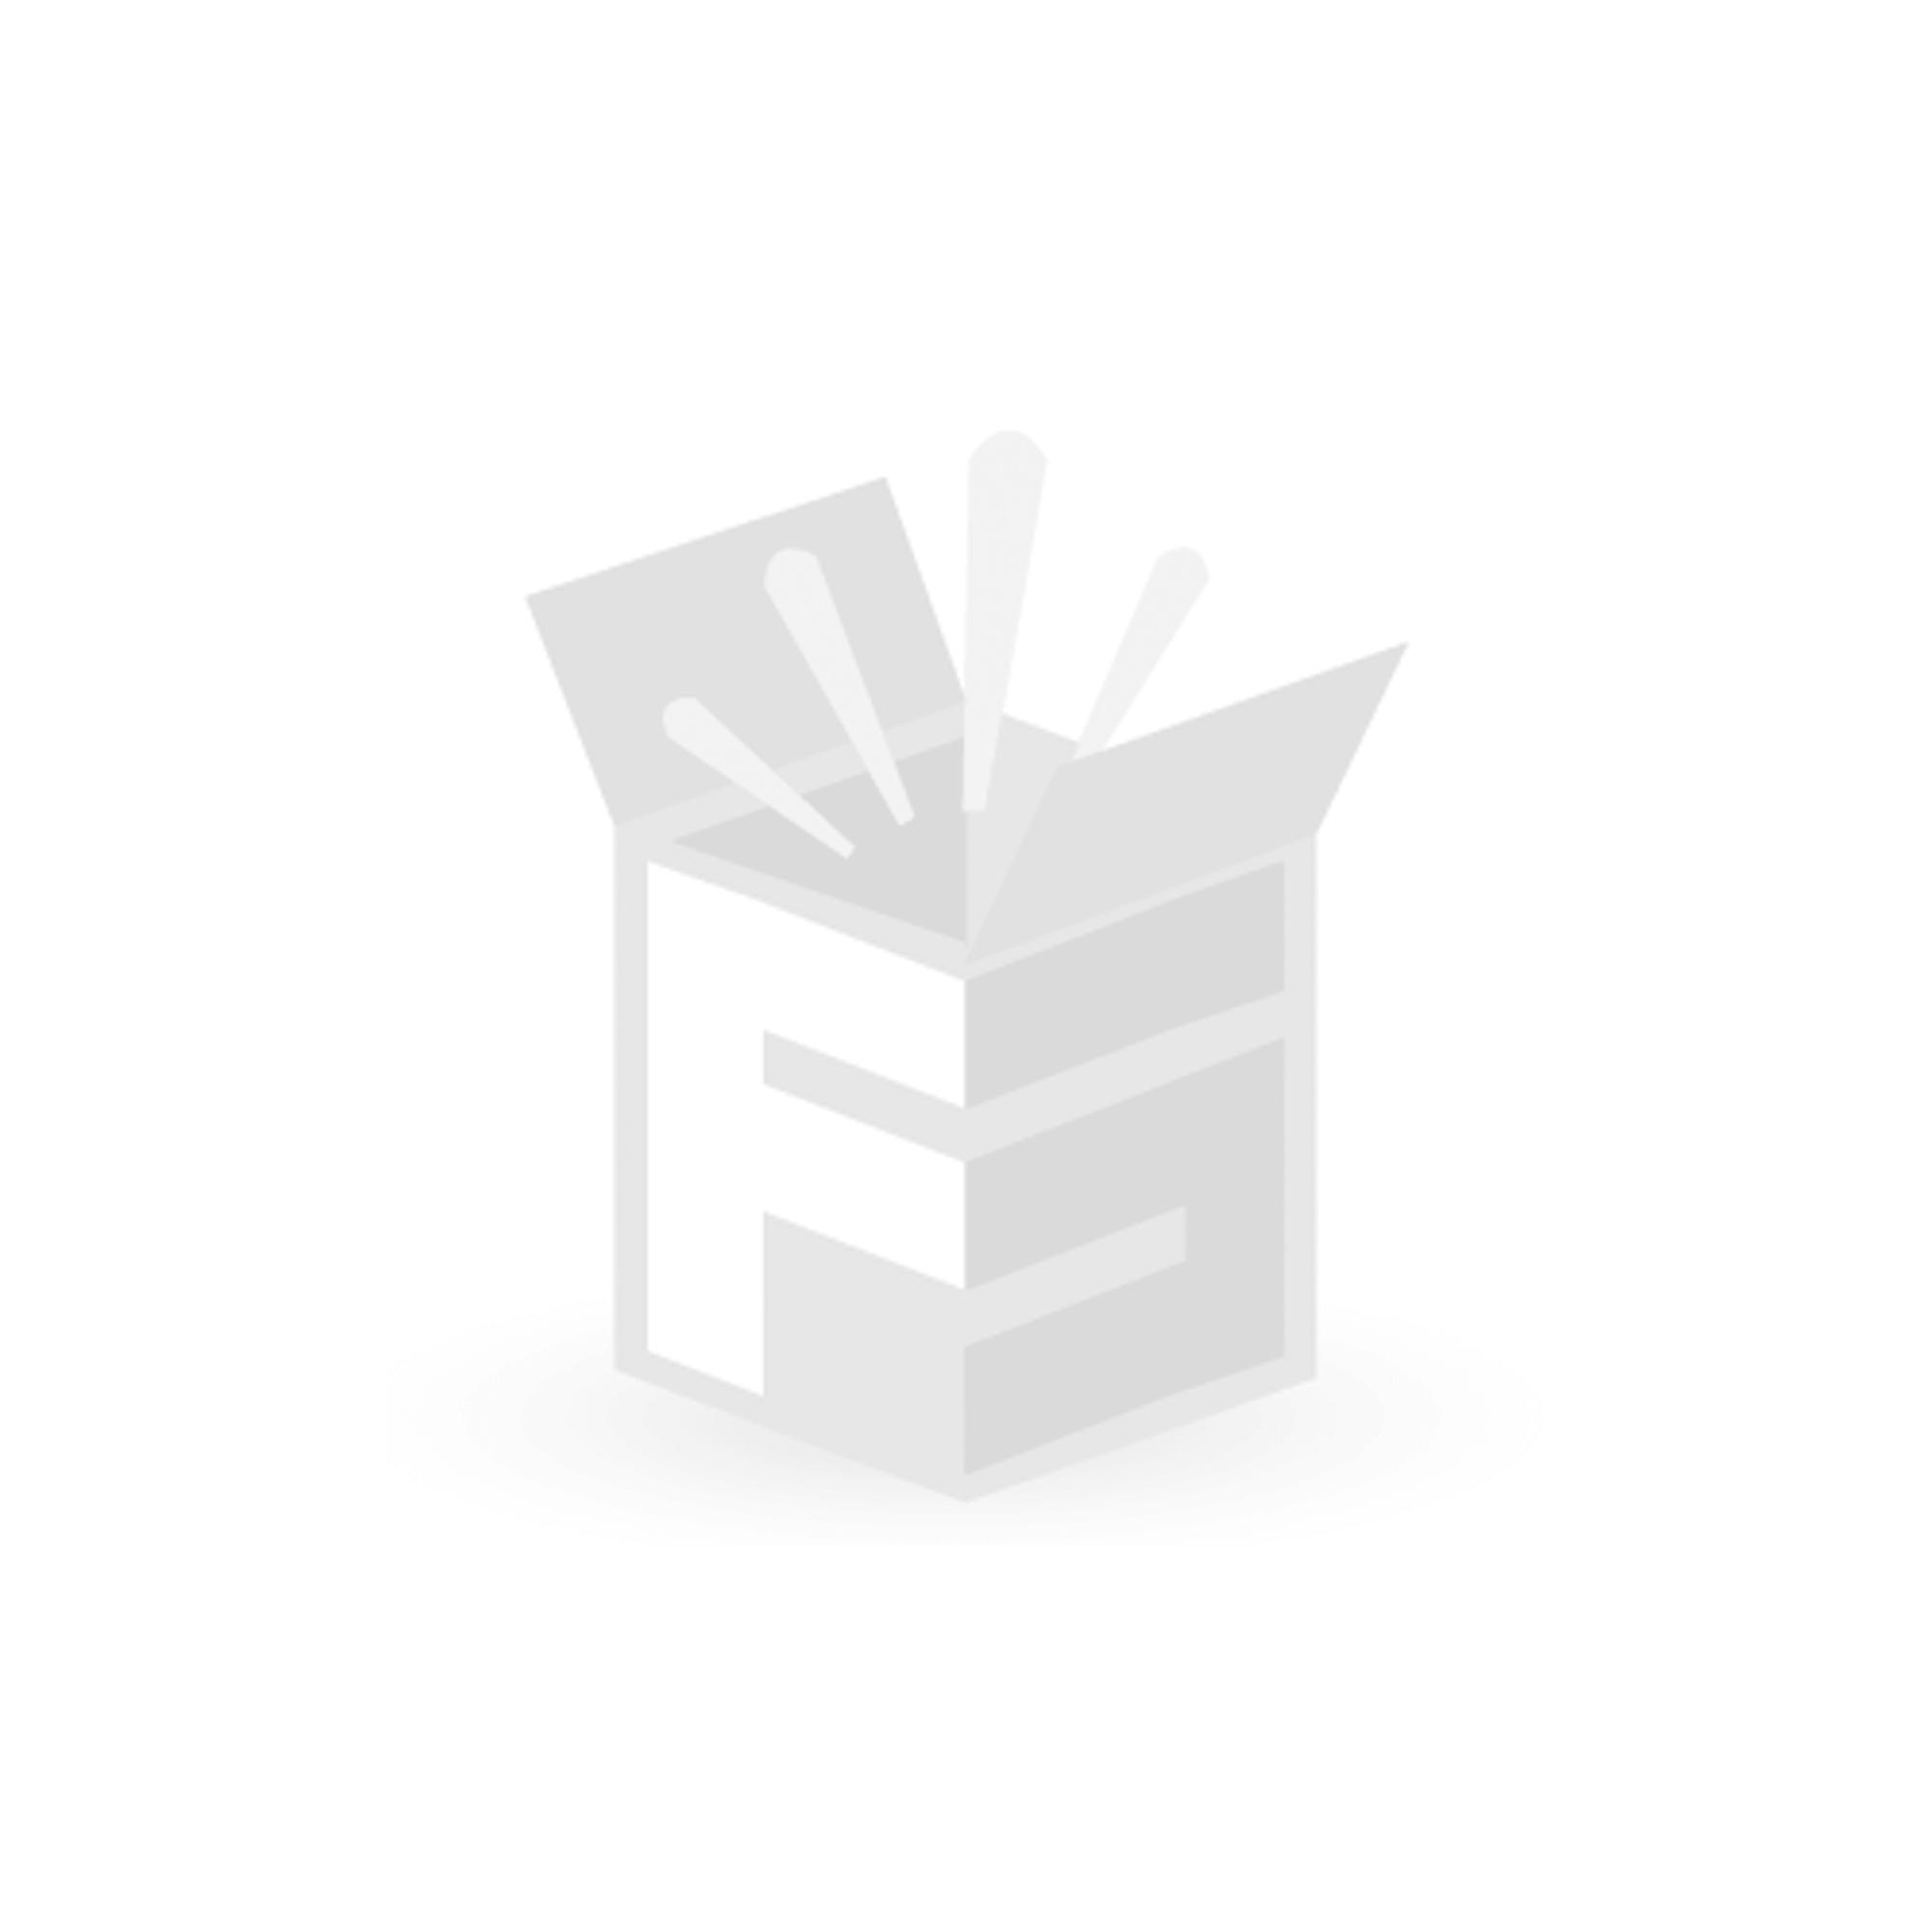 Bosch Perceuse-Visseuse sans fil GSR 18V-28, 2x 4.0 Ah, incl. coffre